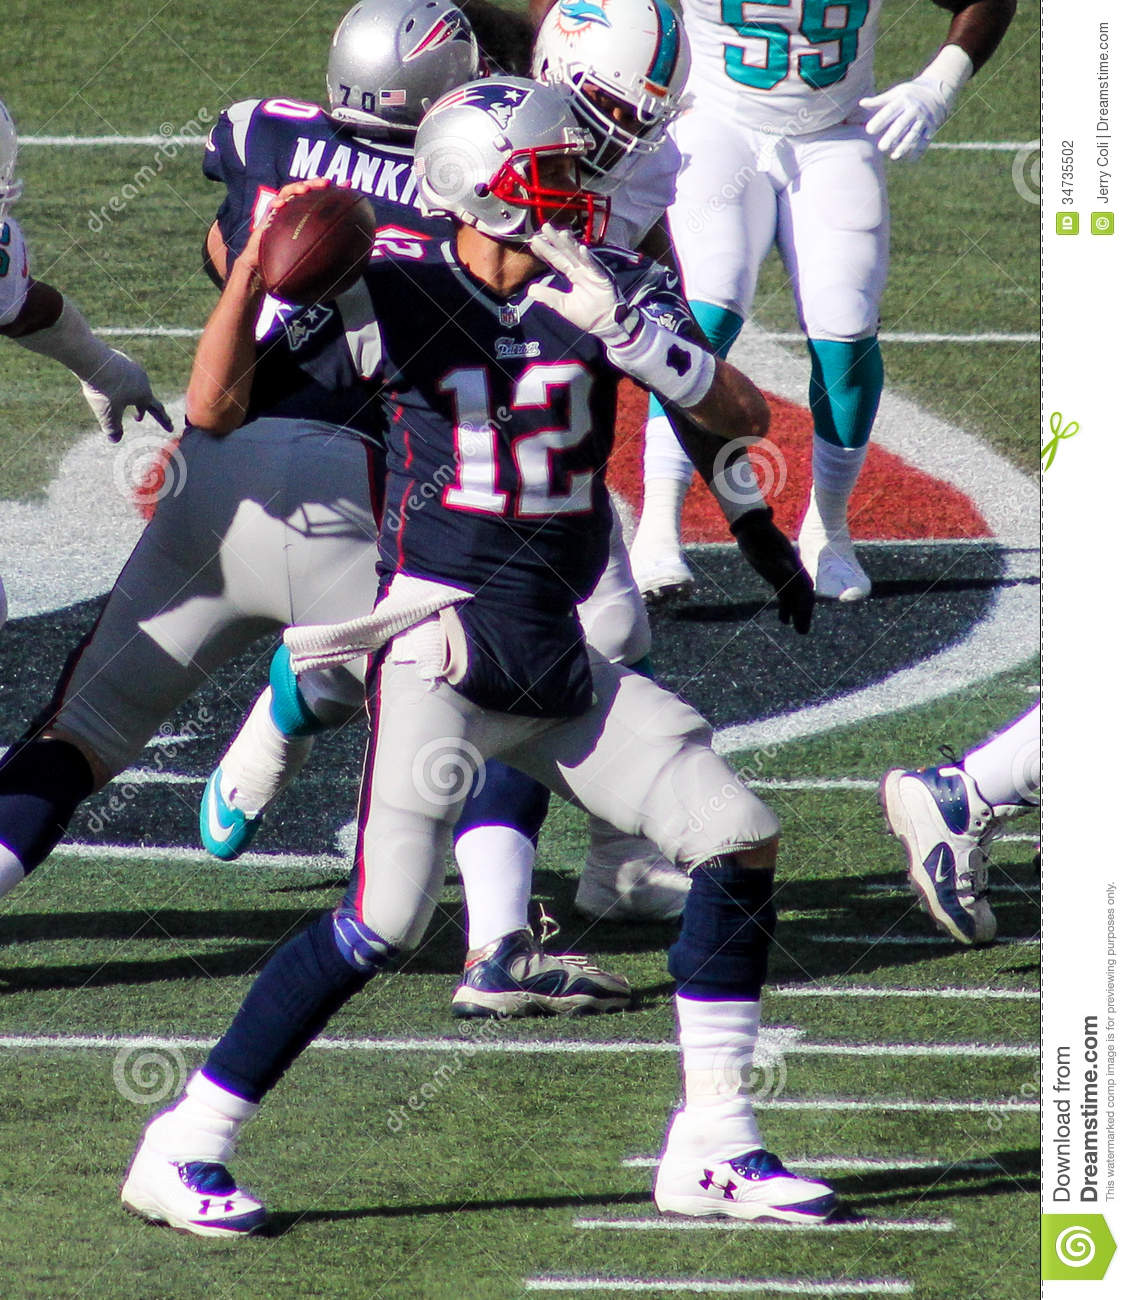 Tom brady clipart clipart freeuse Tom Brady New England Patriots Editorial Photography - Image: 34735502 clipart freeuse